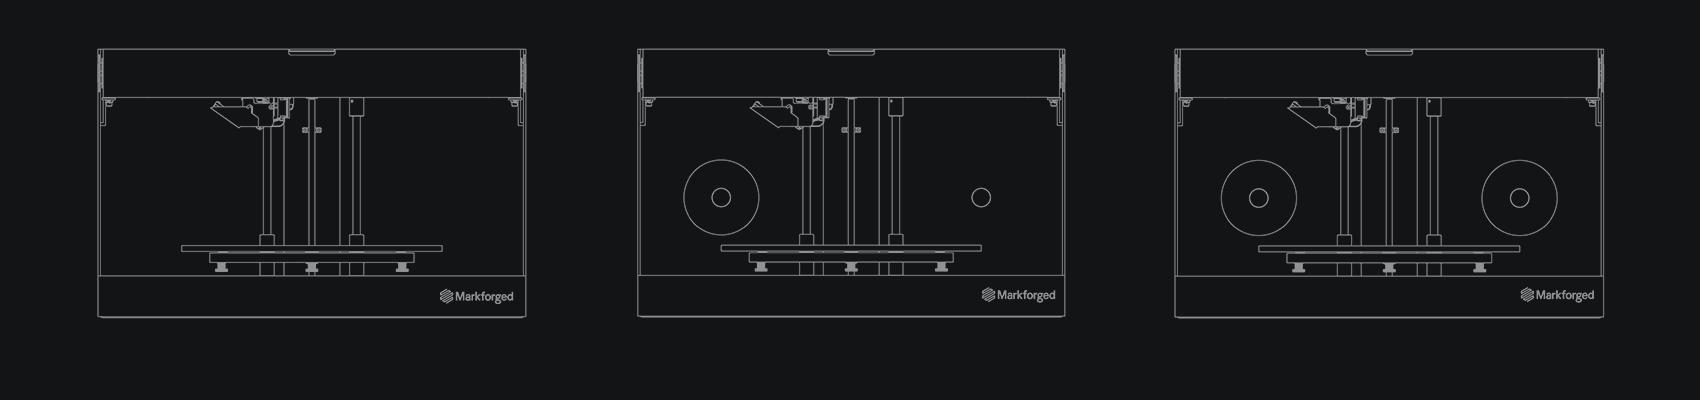 Top-Banner-Desktop-Printers